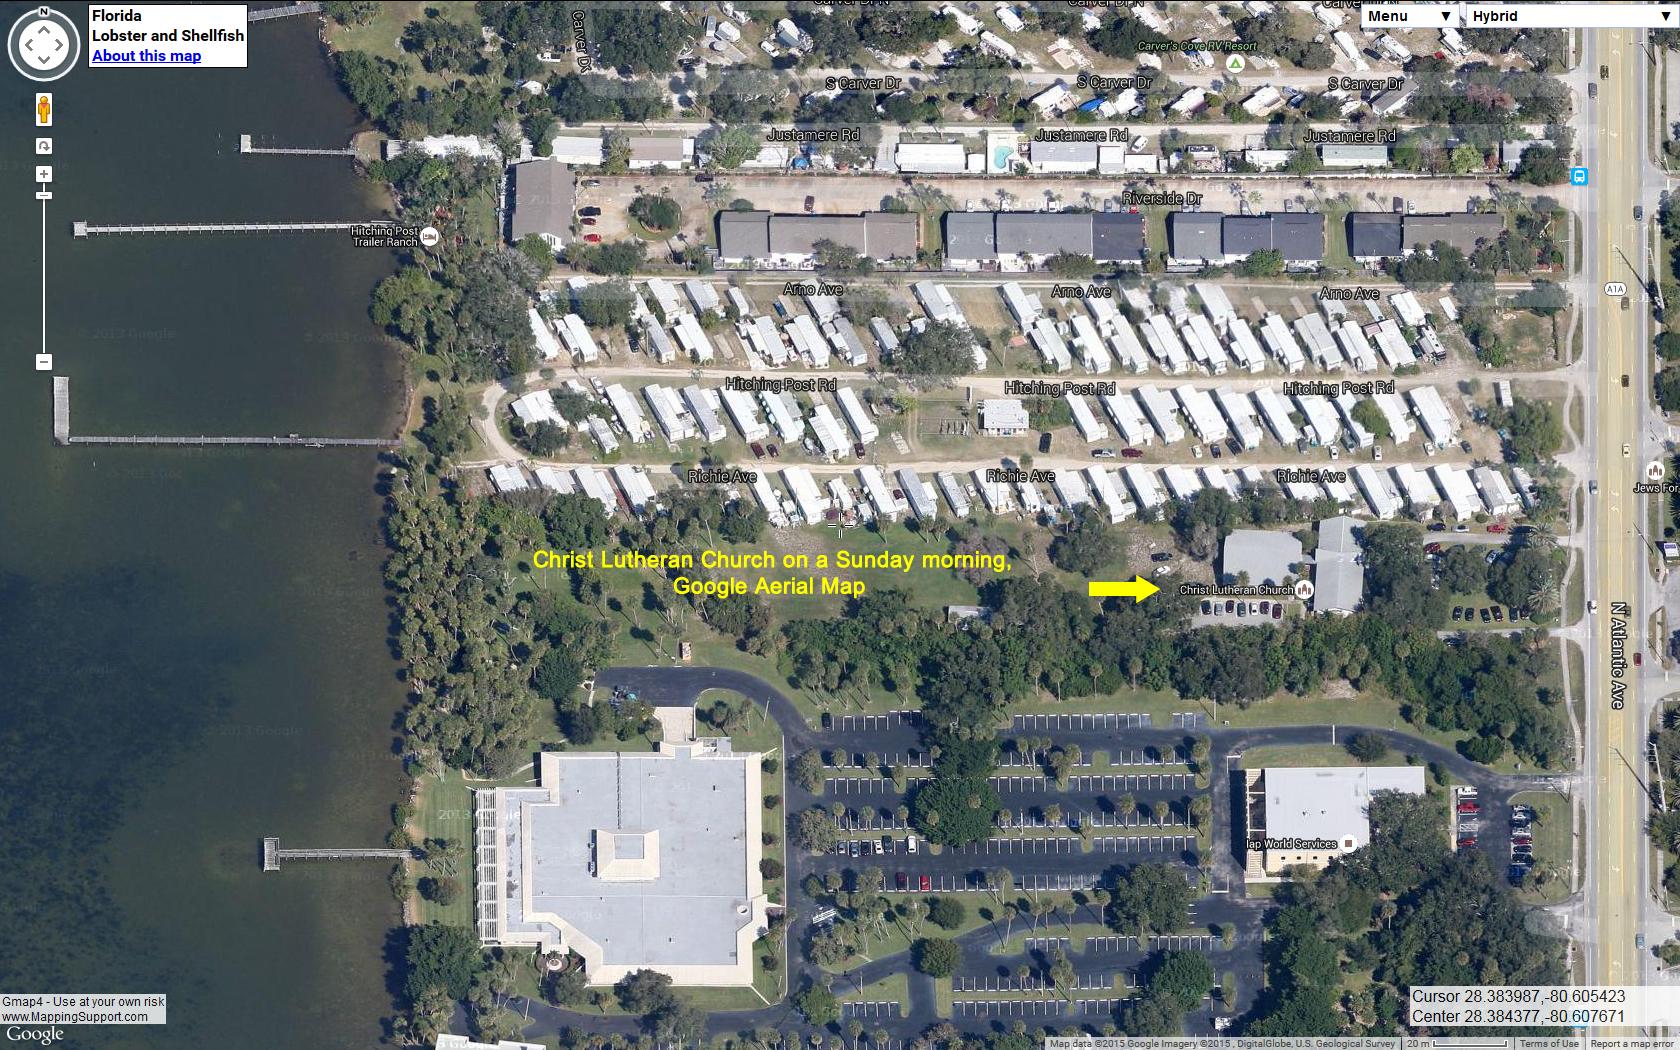 Google-Aerial-Map-of-Christ-Lutheran-Church-Sunday-morning